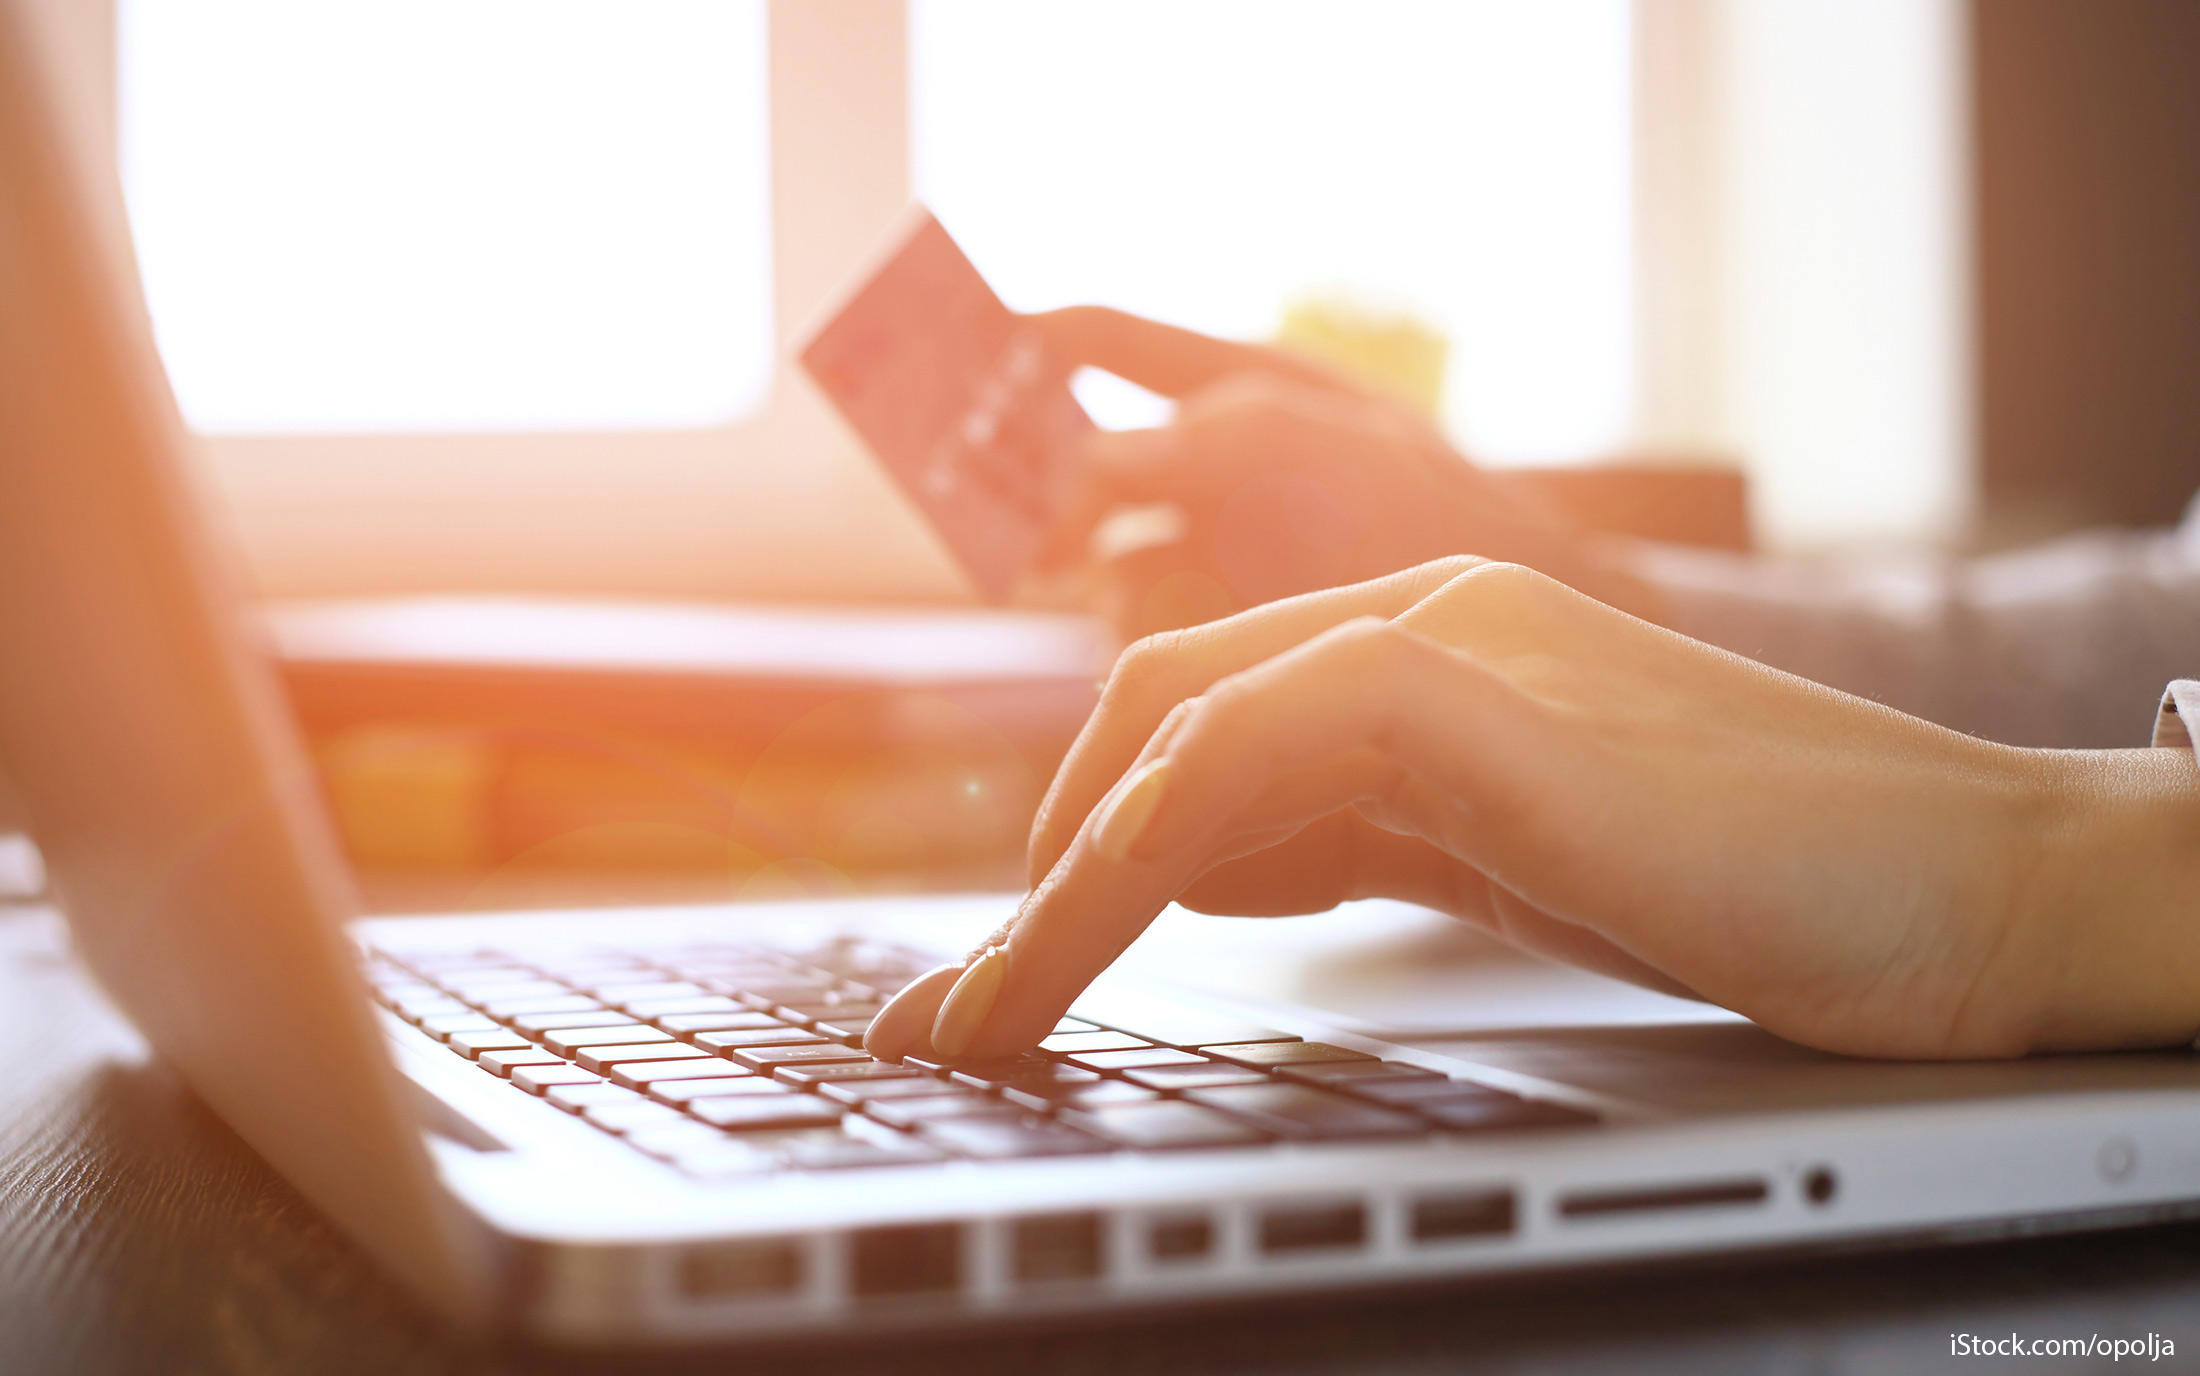 credit card debt cycle trap